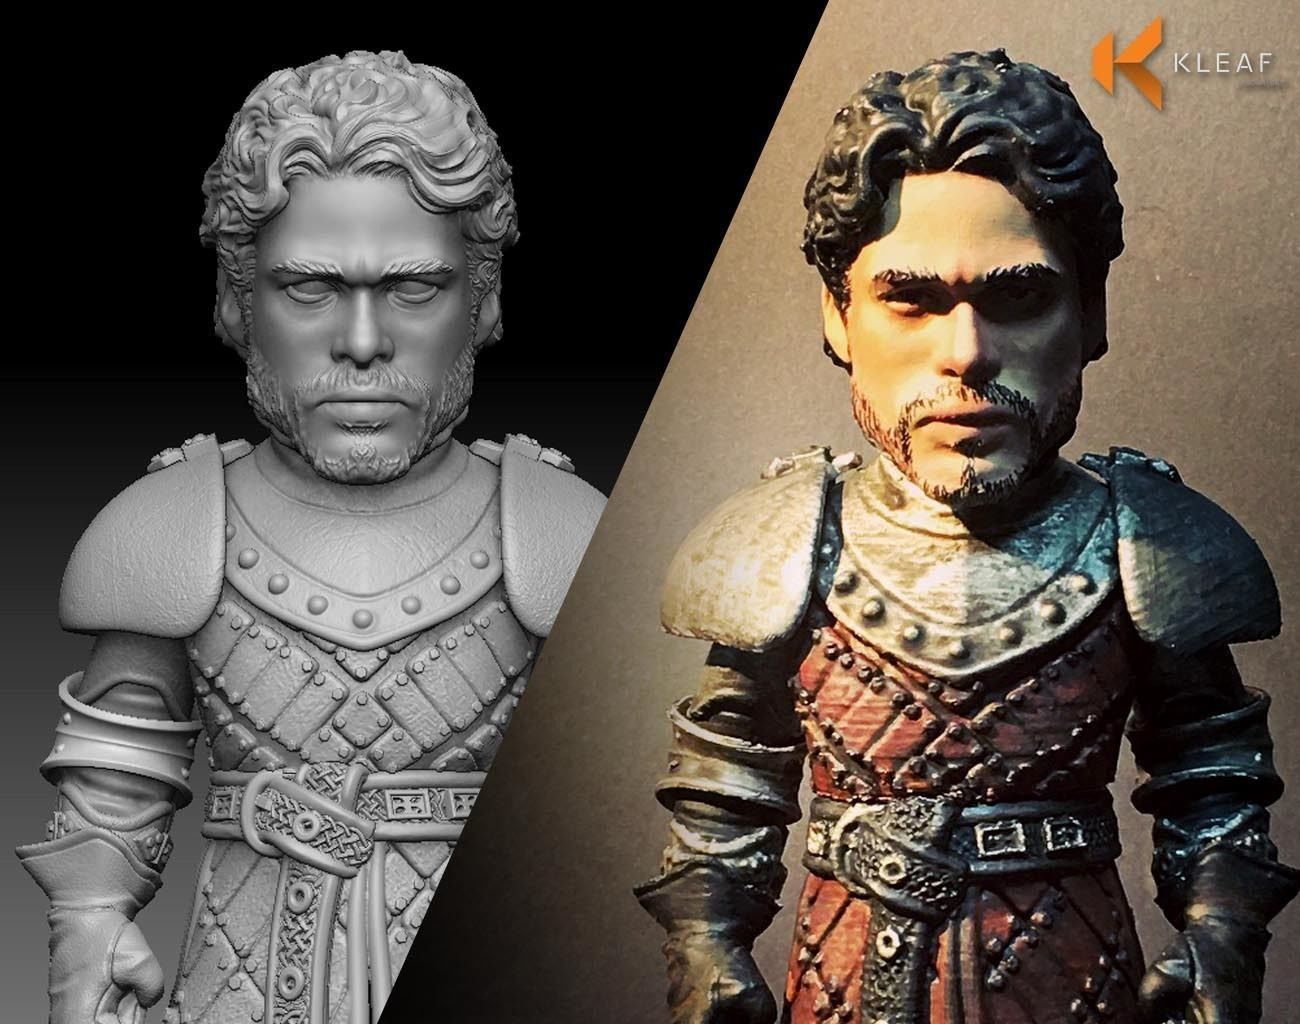 Game of Thrones - Robb Stark